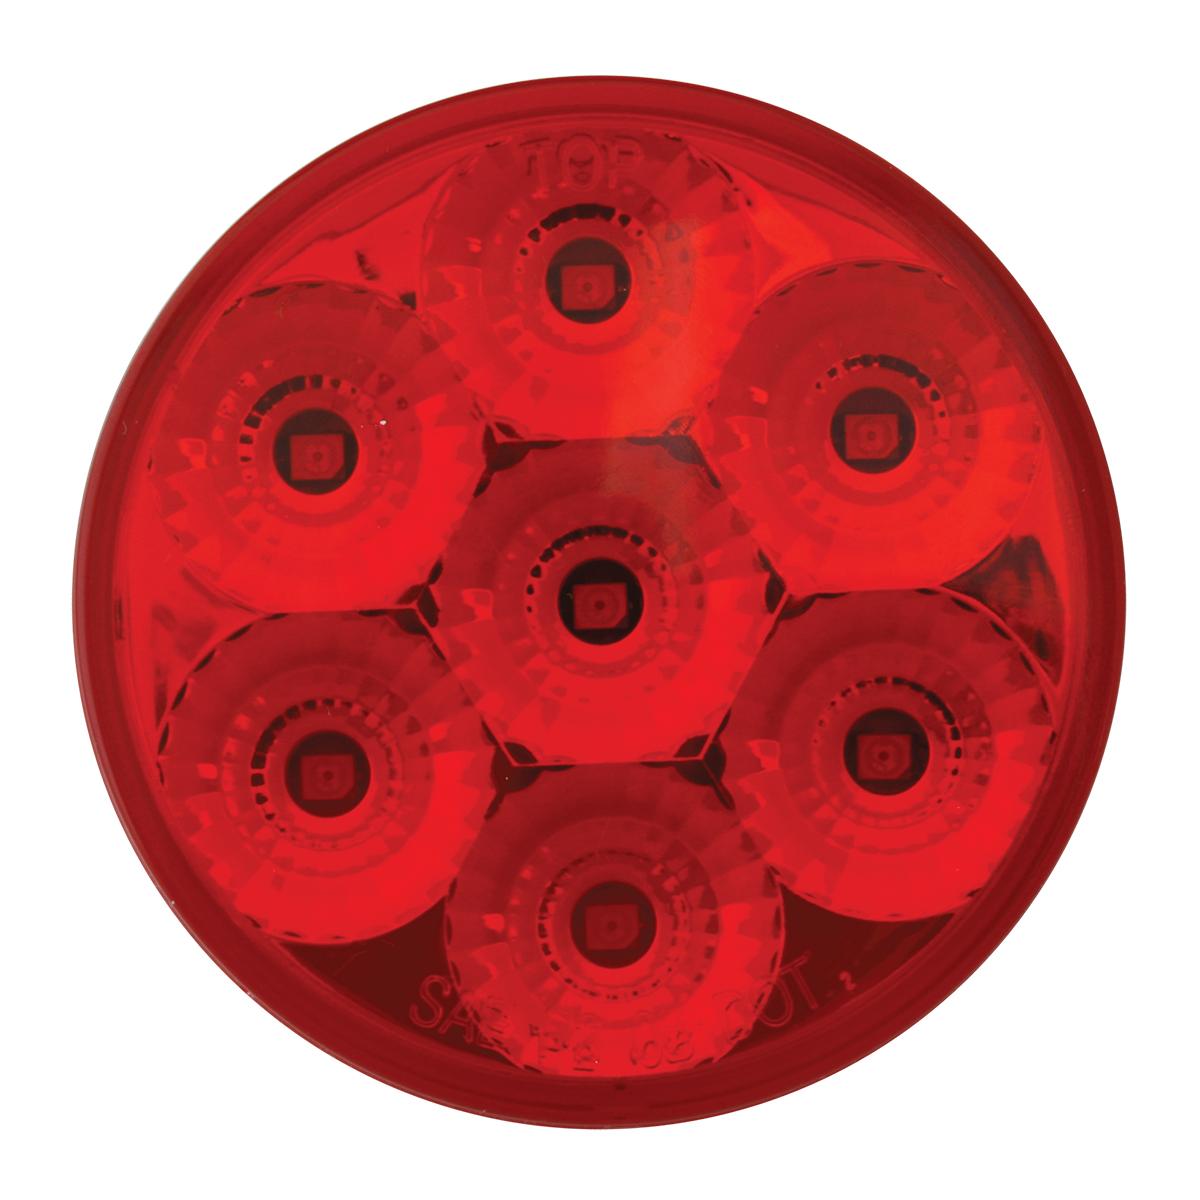 "76622 2"" Spyder LED Marker Light"